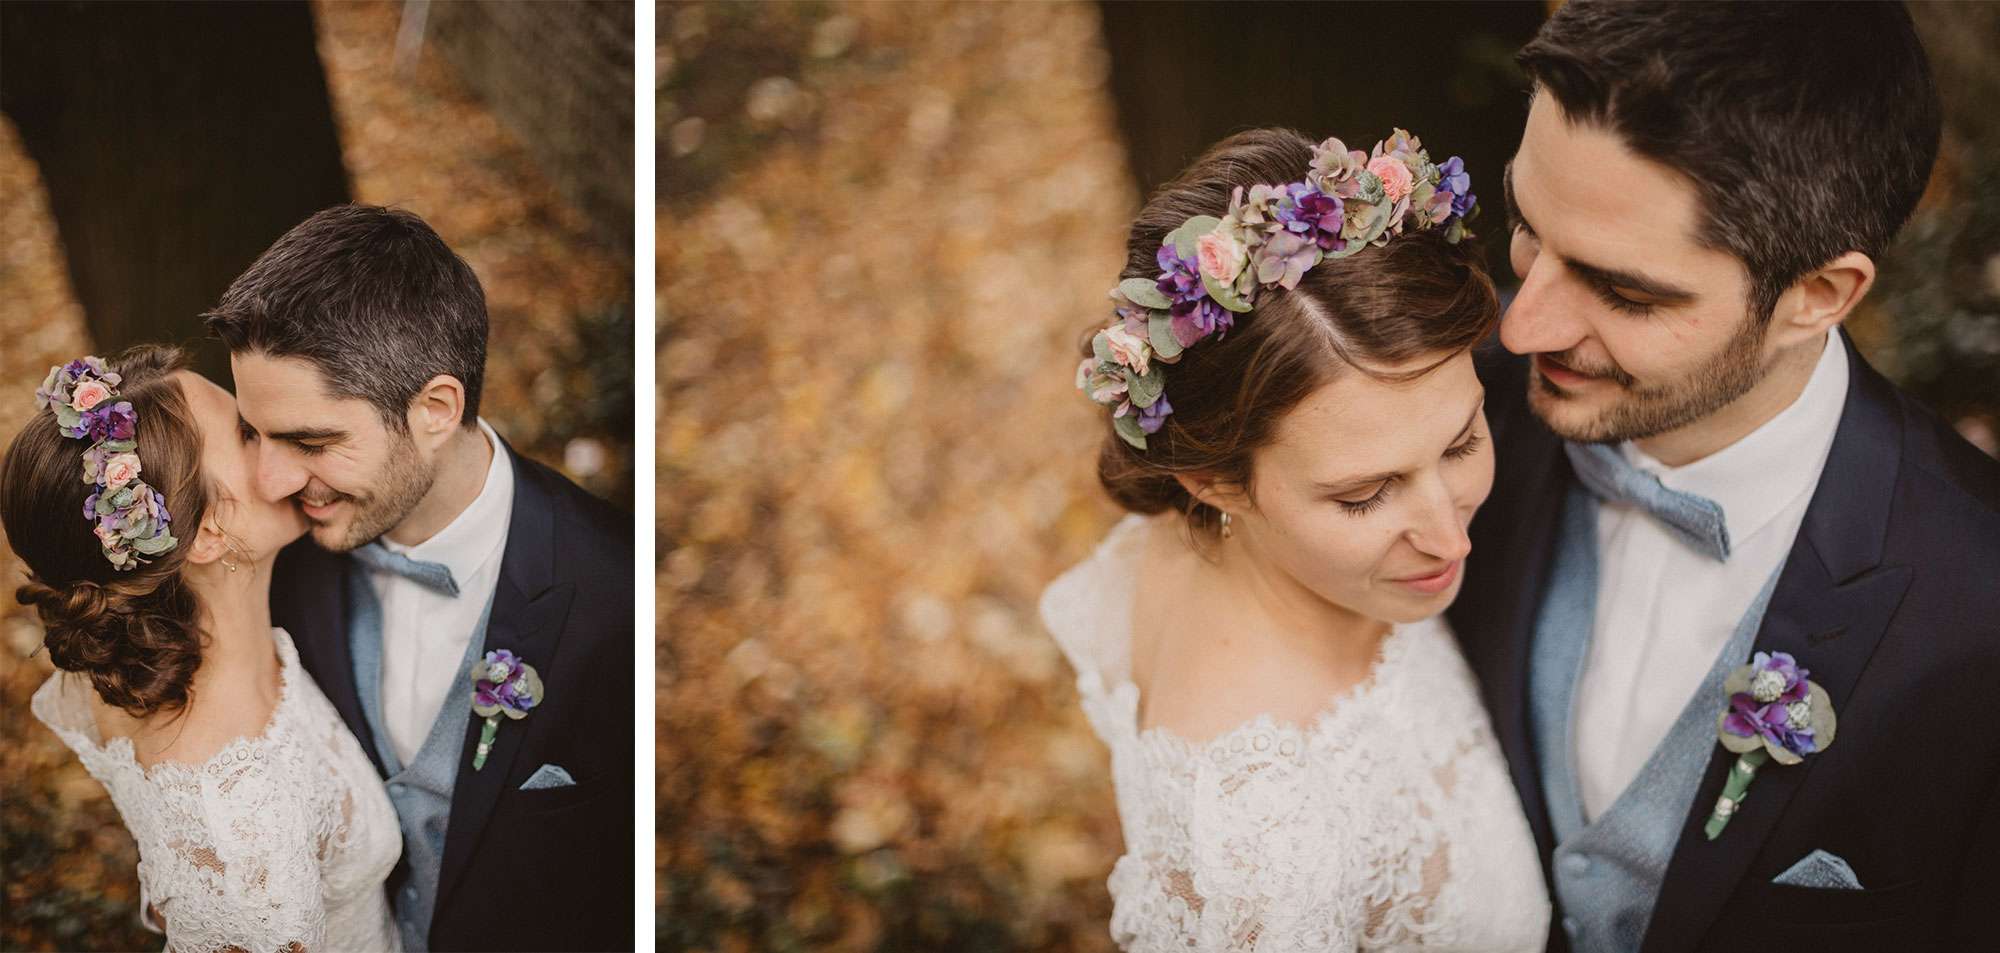 Hochzeitsfotografie-Karlsruhe-Ronja-Flo-33